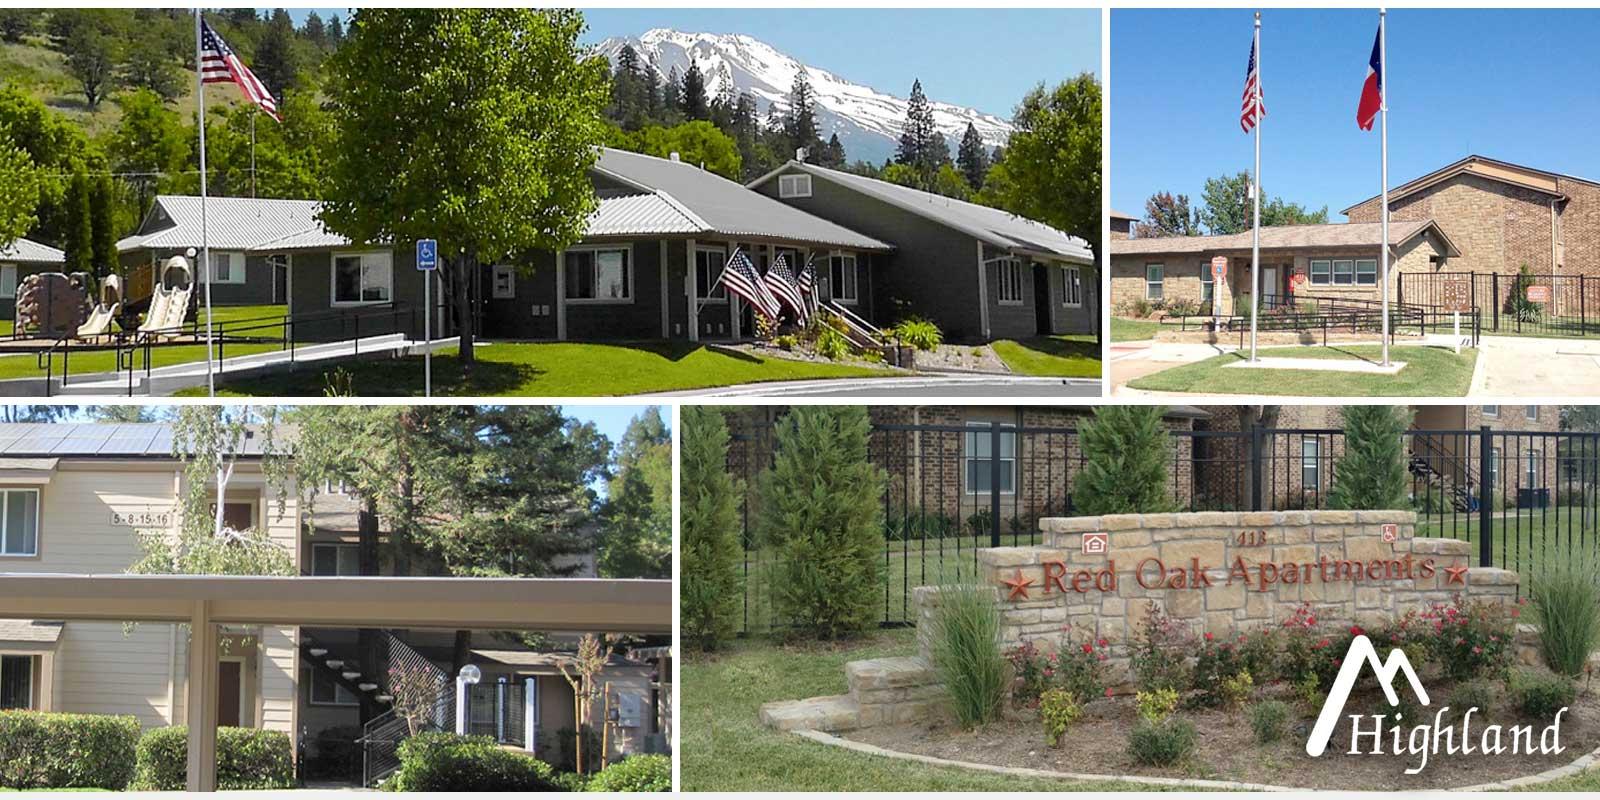 Highland Property Development background